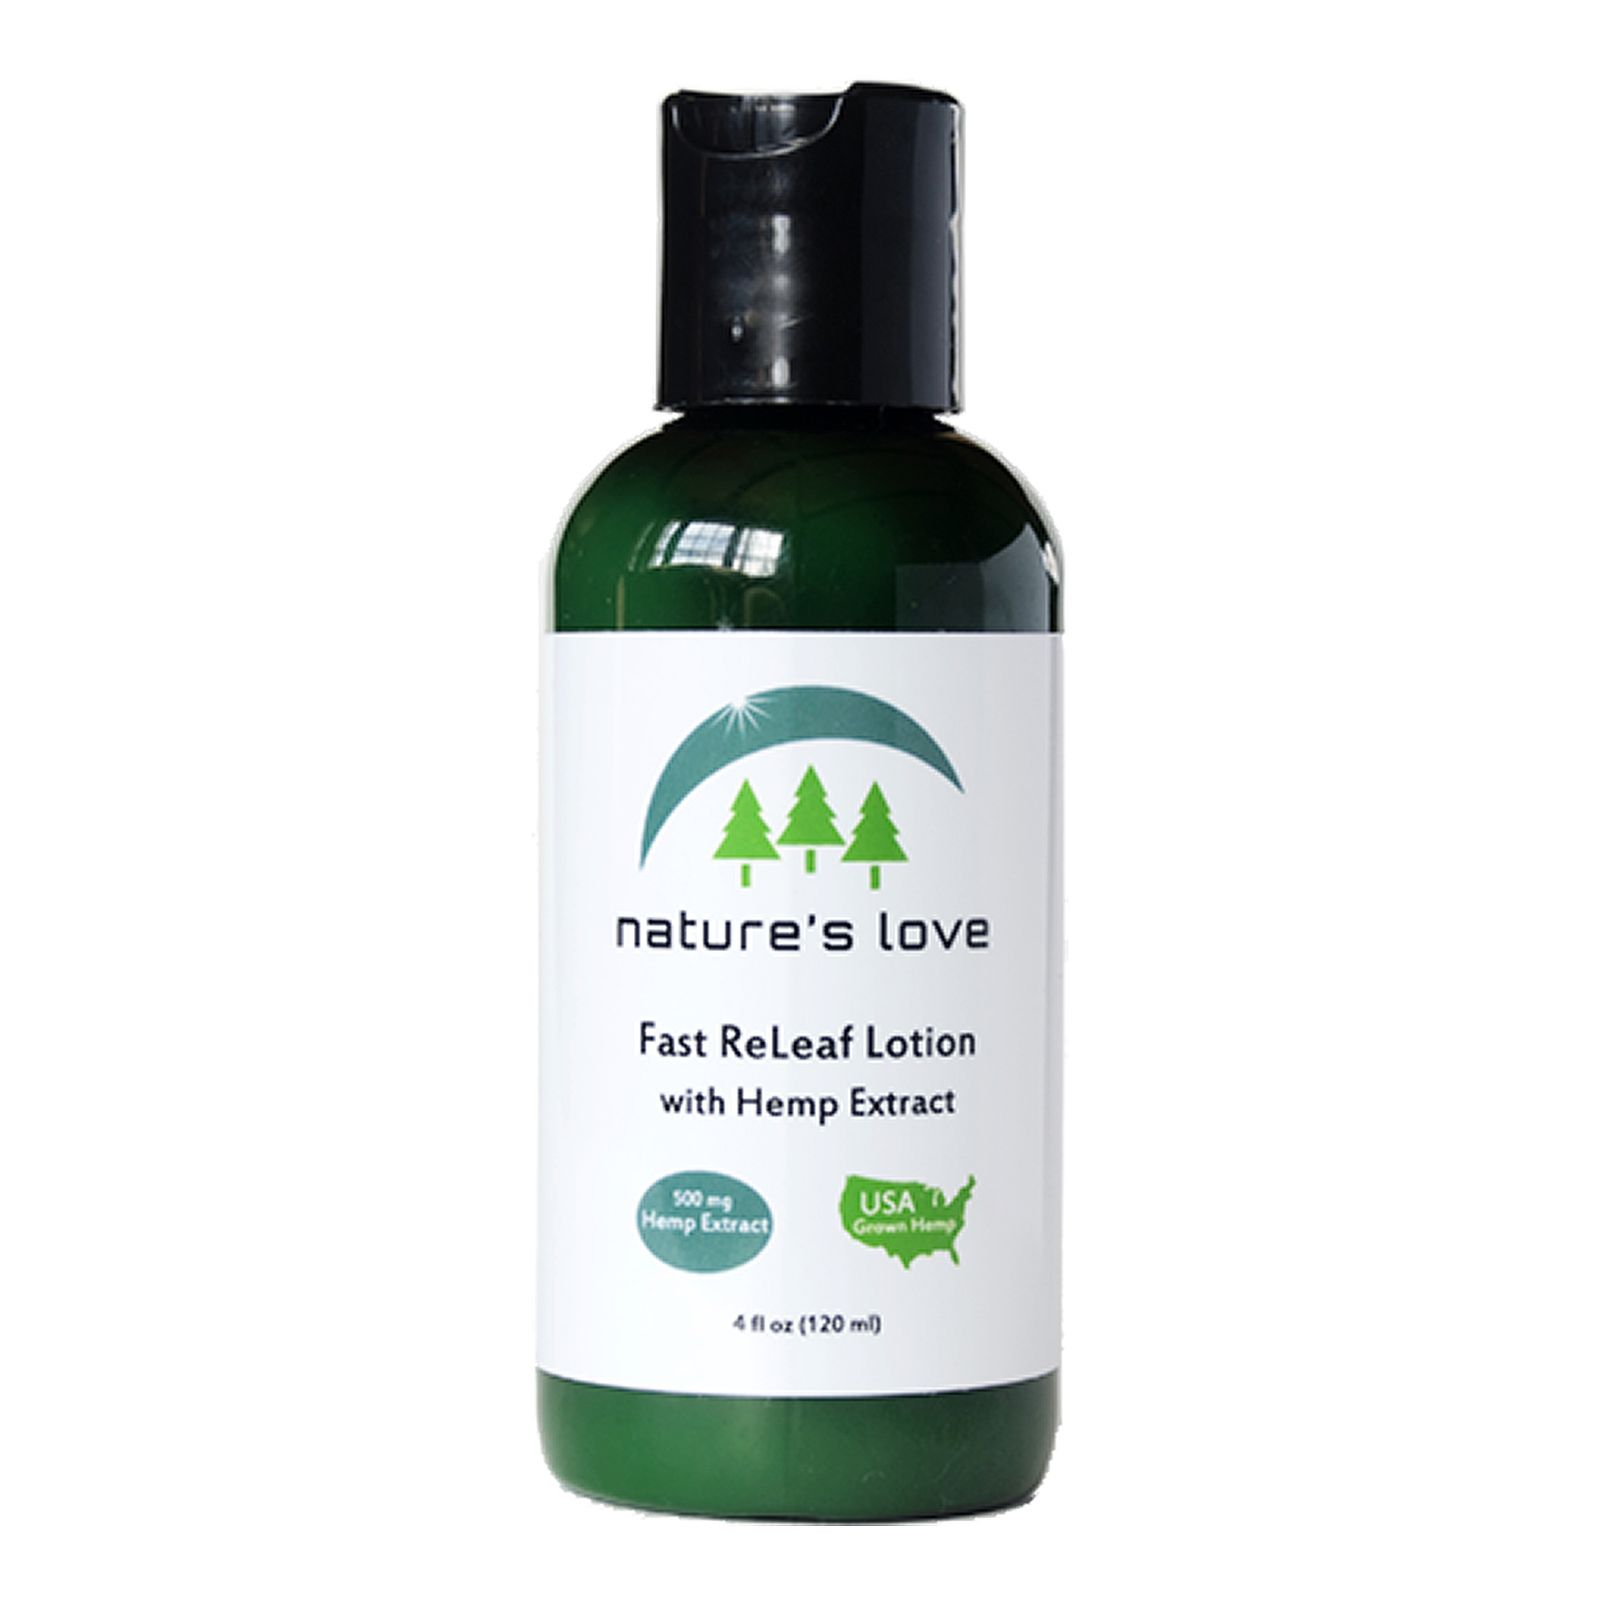 Fast ReLeaf Full-Spectrum Hemp Extract Lotion Lemongrass 450 mg 4 fl. oz. (118 mL)